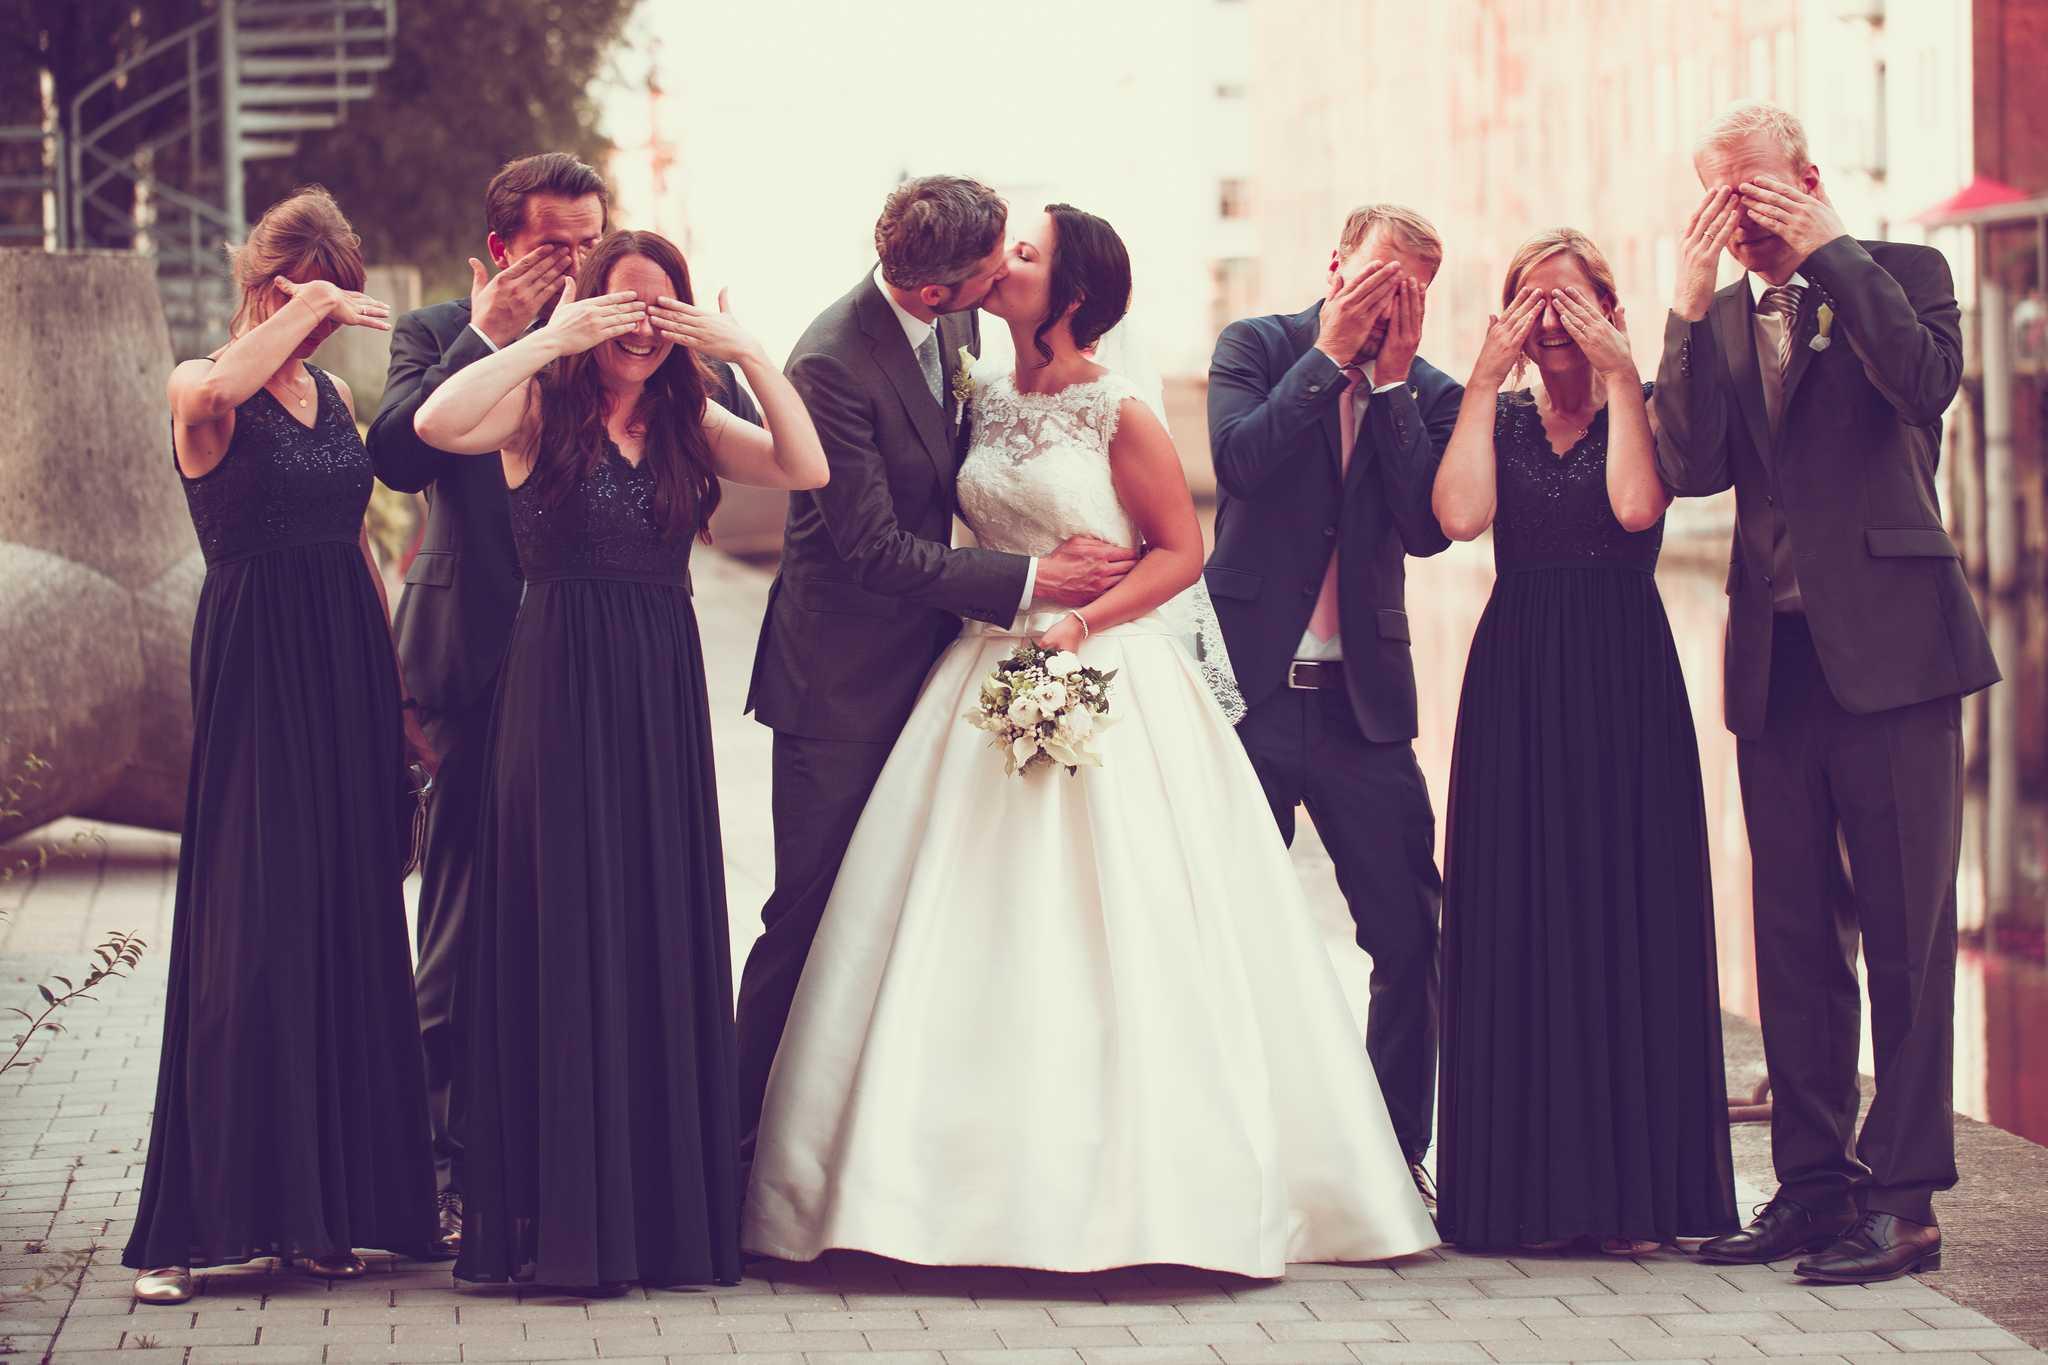 wedding-kaphi22.jpg